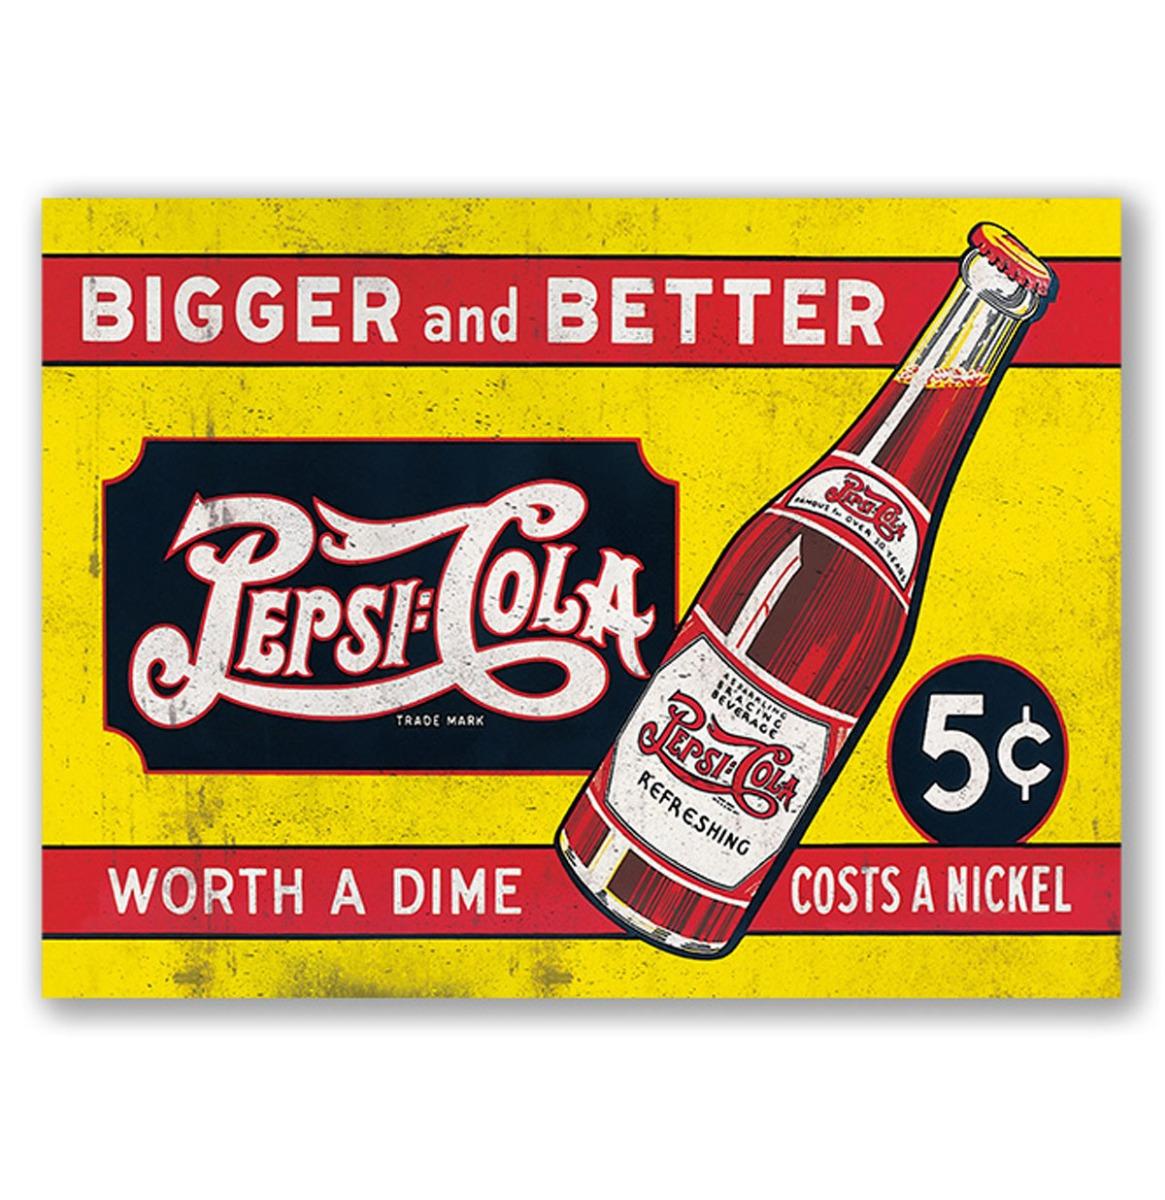 Pepsi-Cola Bigger And Better Worth A Dime, Costs A Nickel Metalen Bord Met Reliëf - 43 x 31 cm